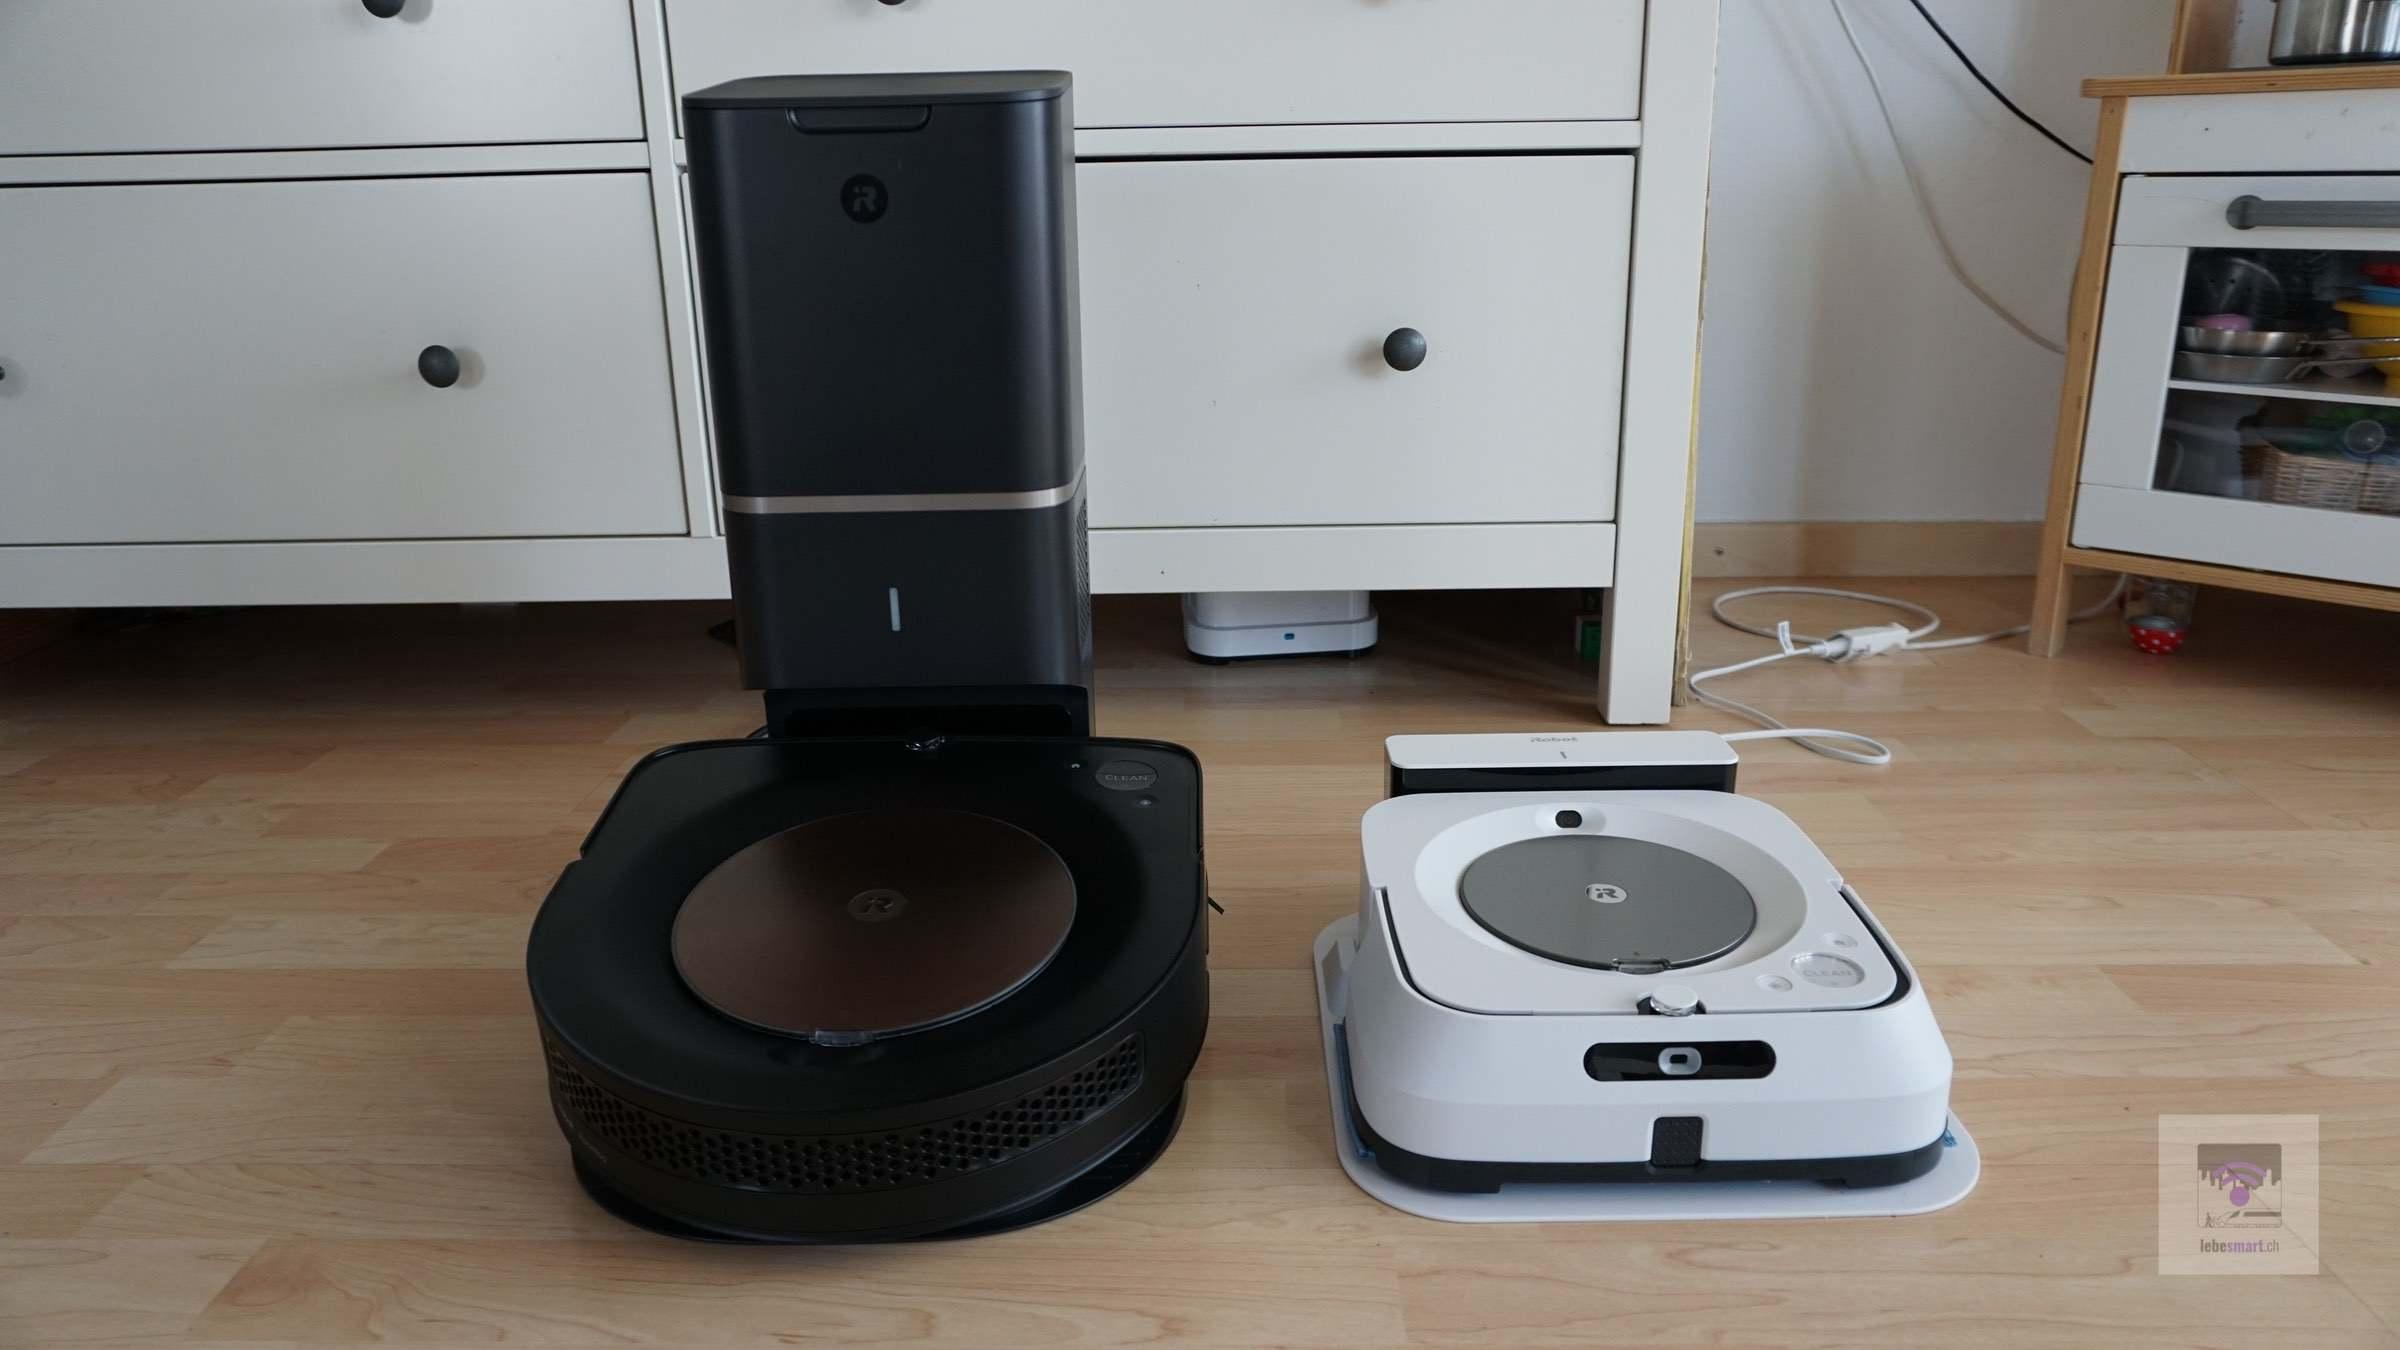 Ankündigung – iRobot Roomba s9+ und Braava Jet M6 im Test